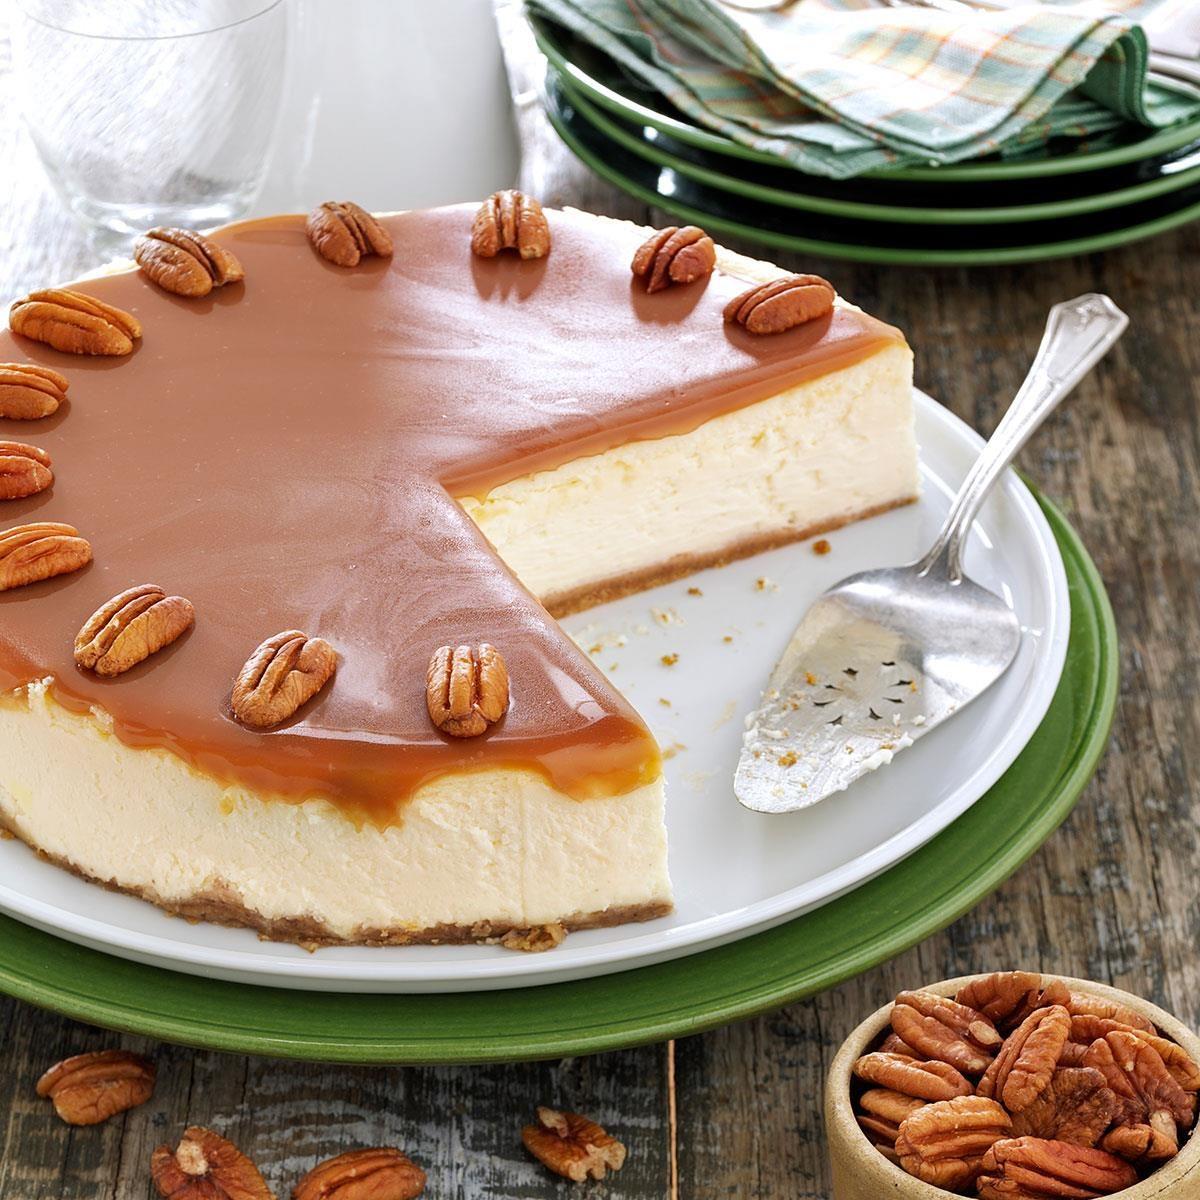 Caramel Praline Cheesecake Recipe | Taste of Home